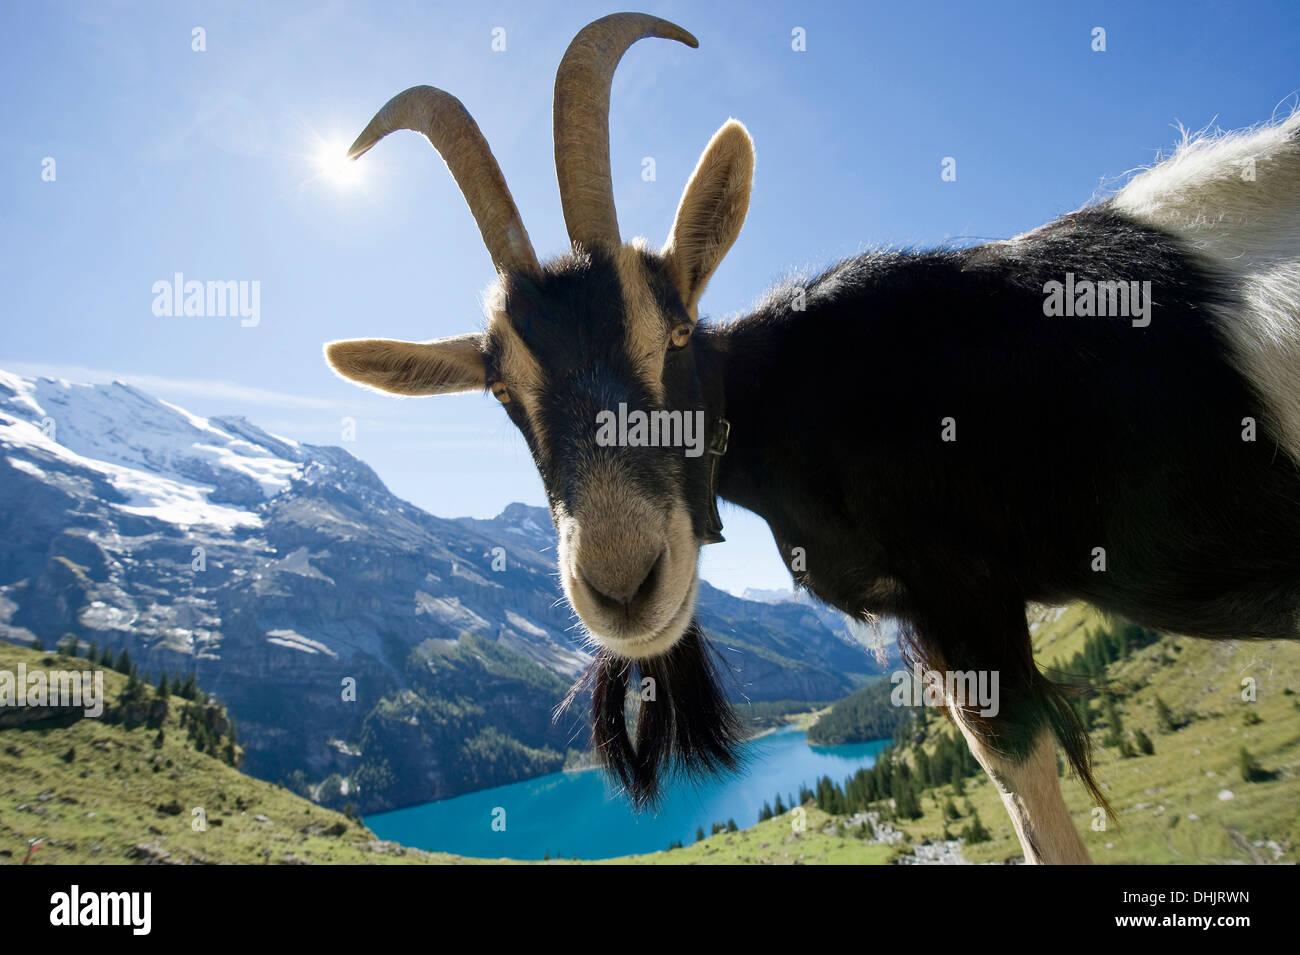 Goat and lake Oeschinensee, Kandersteg, Bernese Oberland, Canton of Bern, Switzerland, Europe Stock Photo